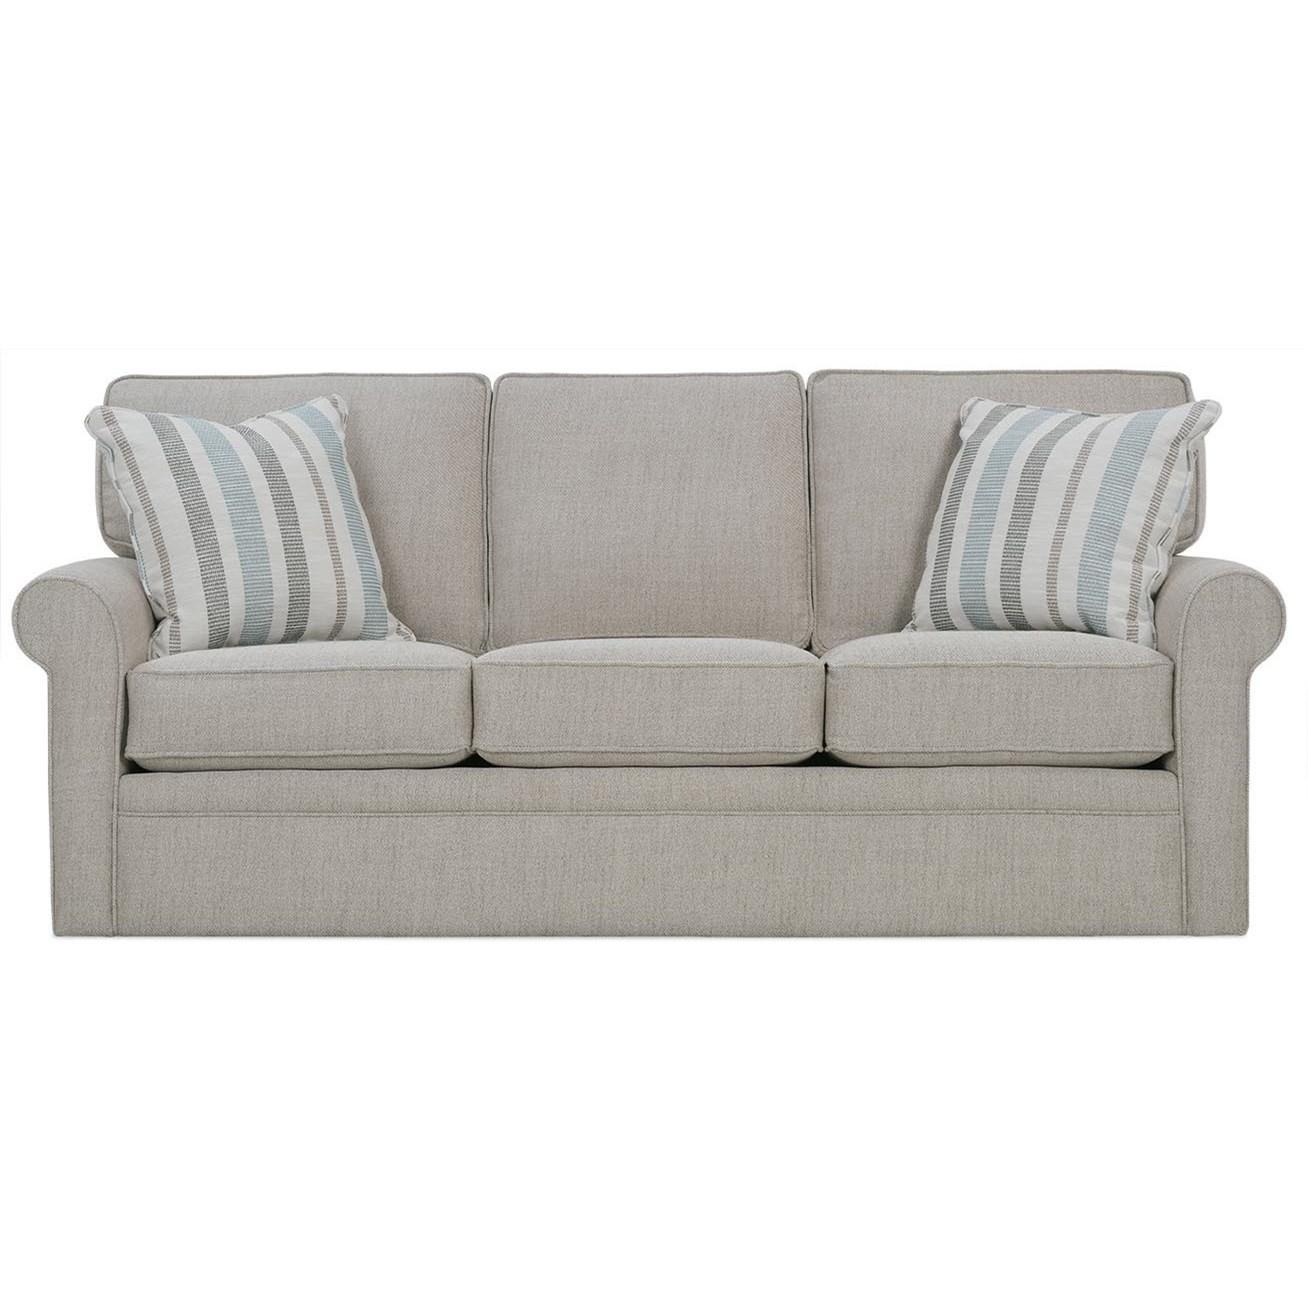 Dalton Queen Sofa Sleeper by Rowe at Baer's Furniture